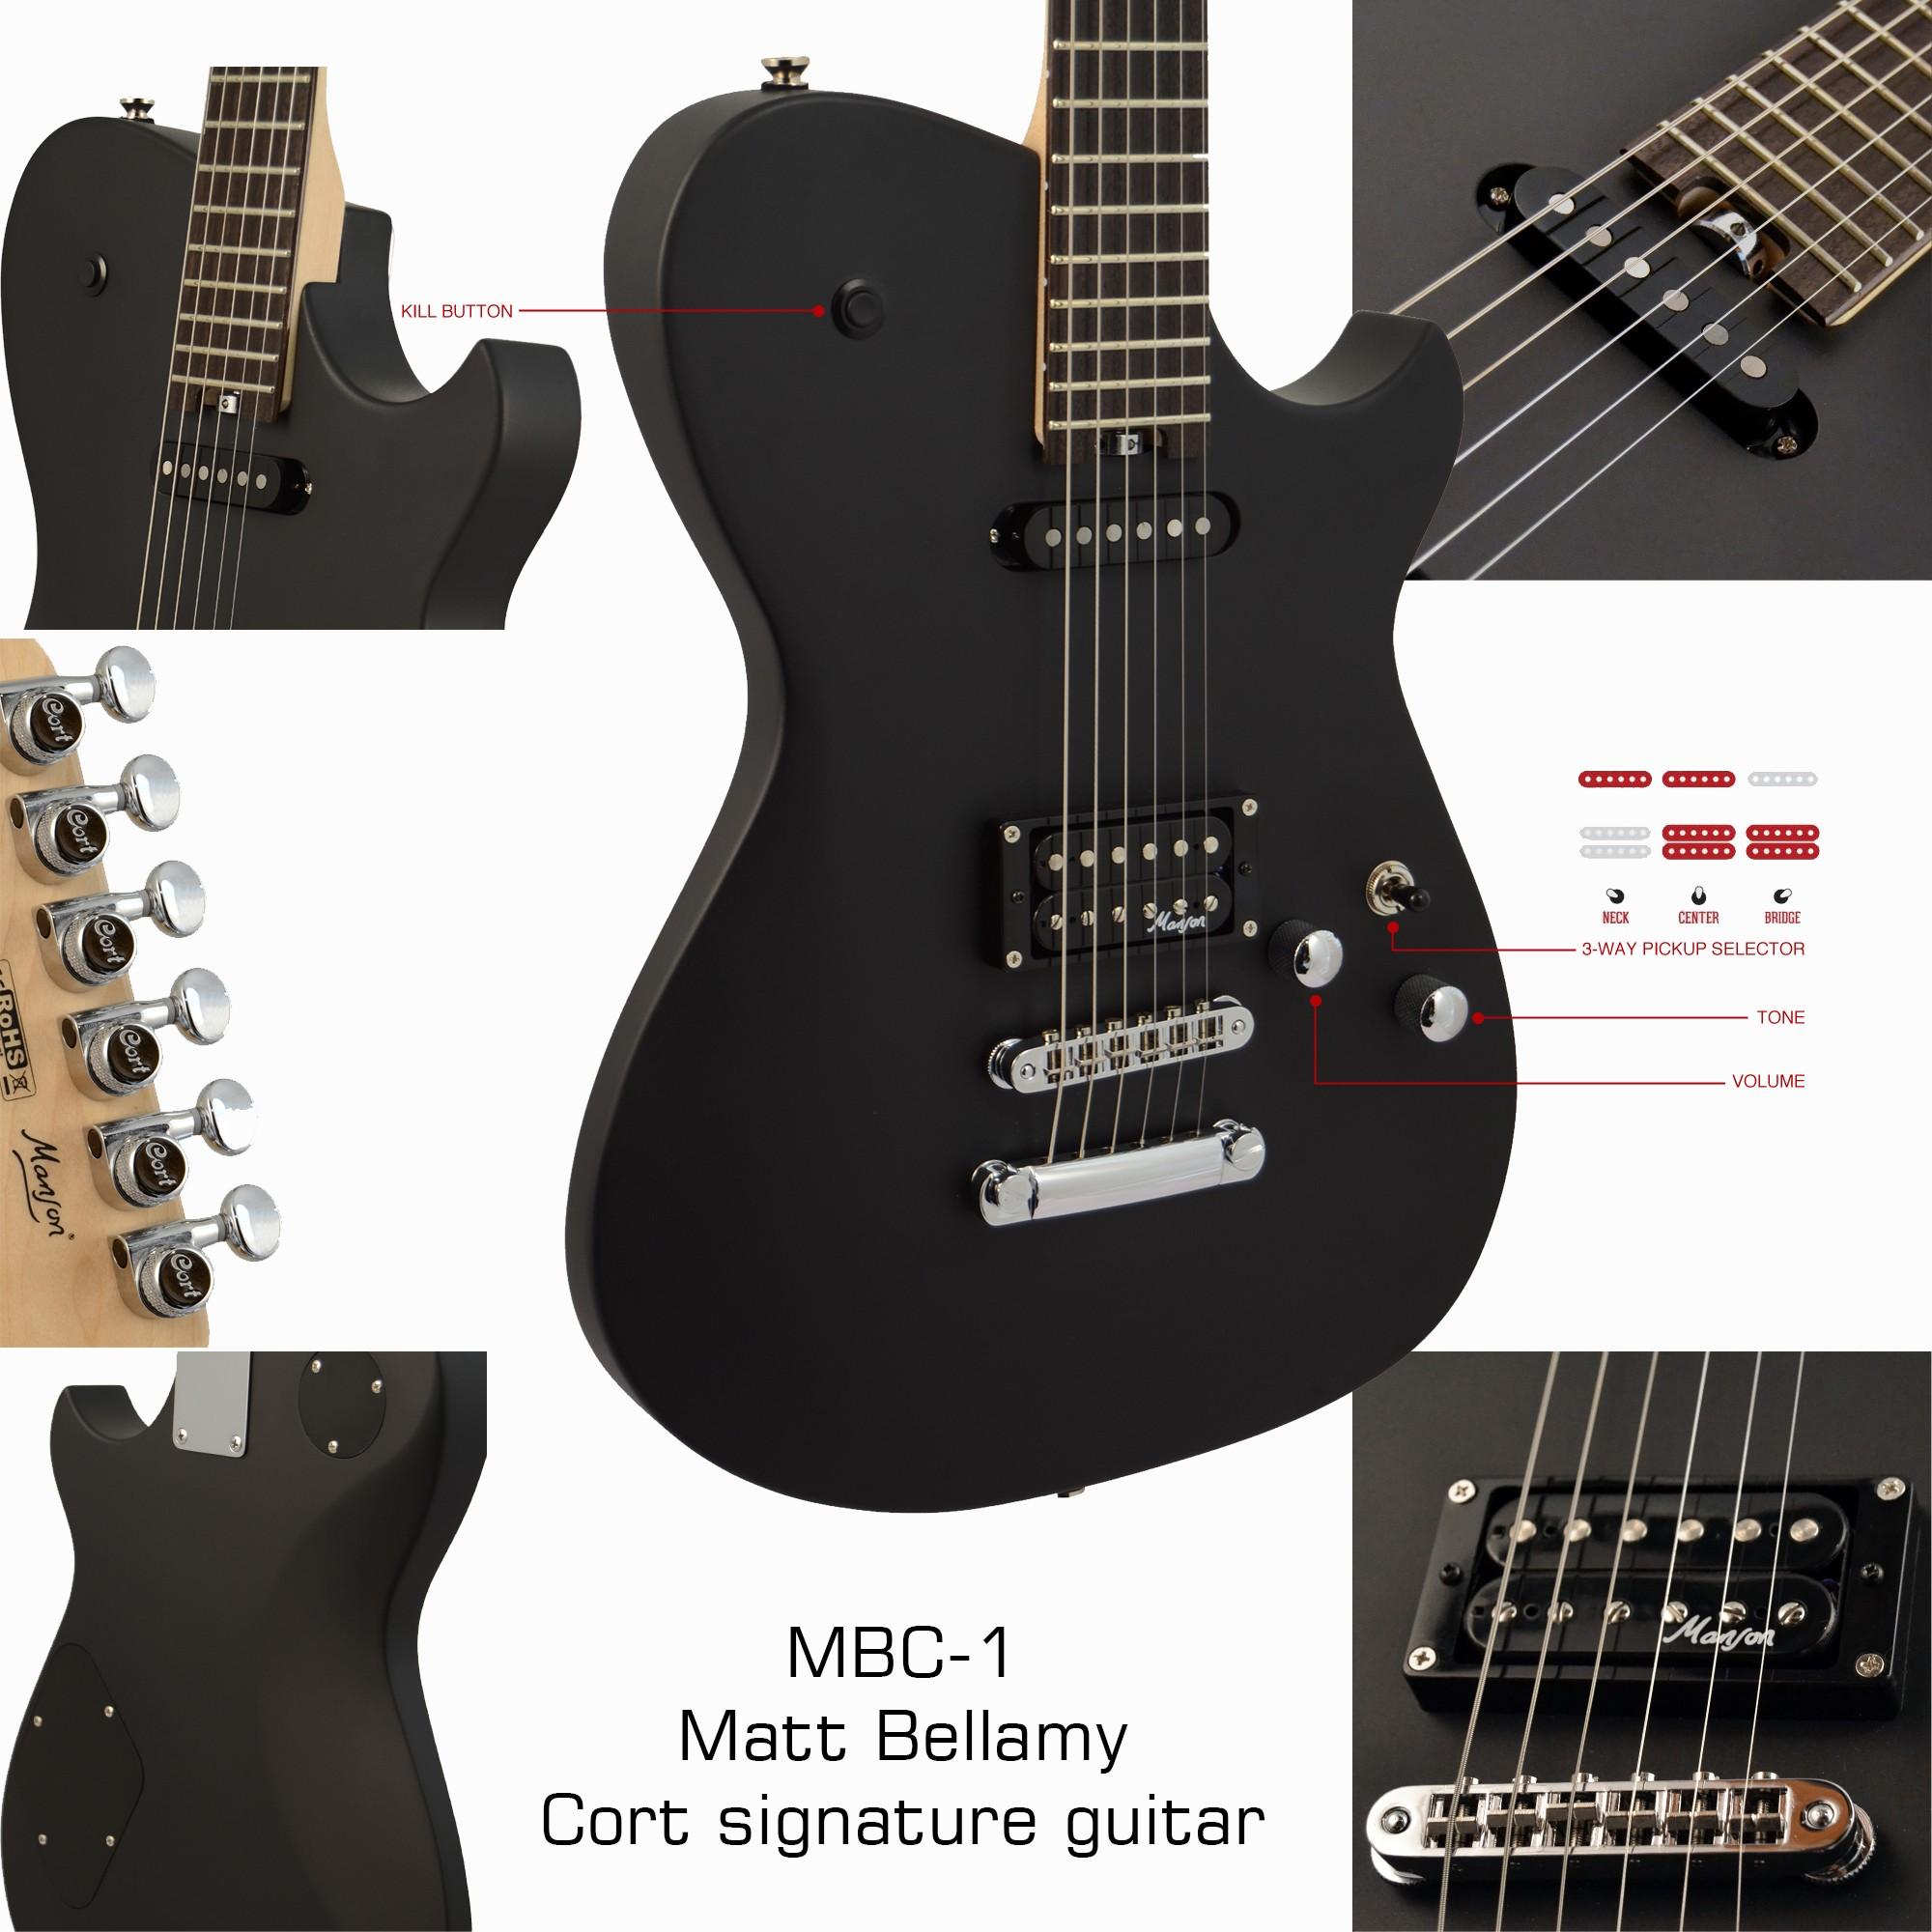 MBC-1 Matt Bellamy Cort signature guitar